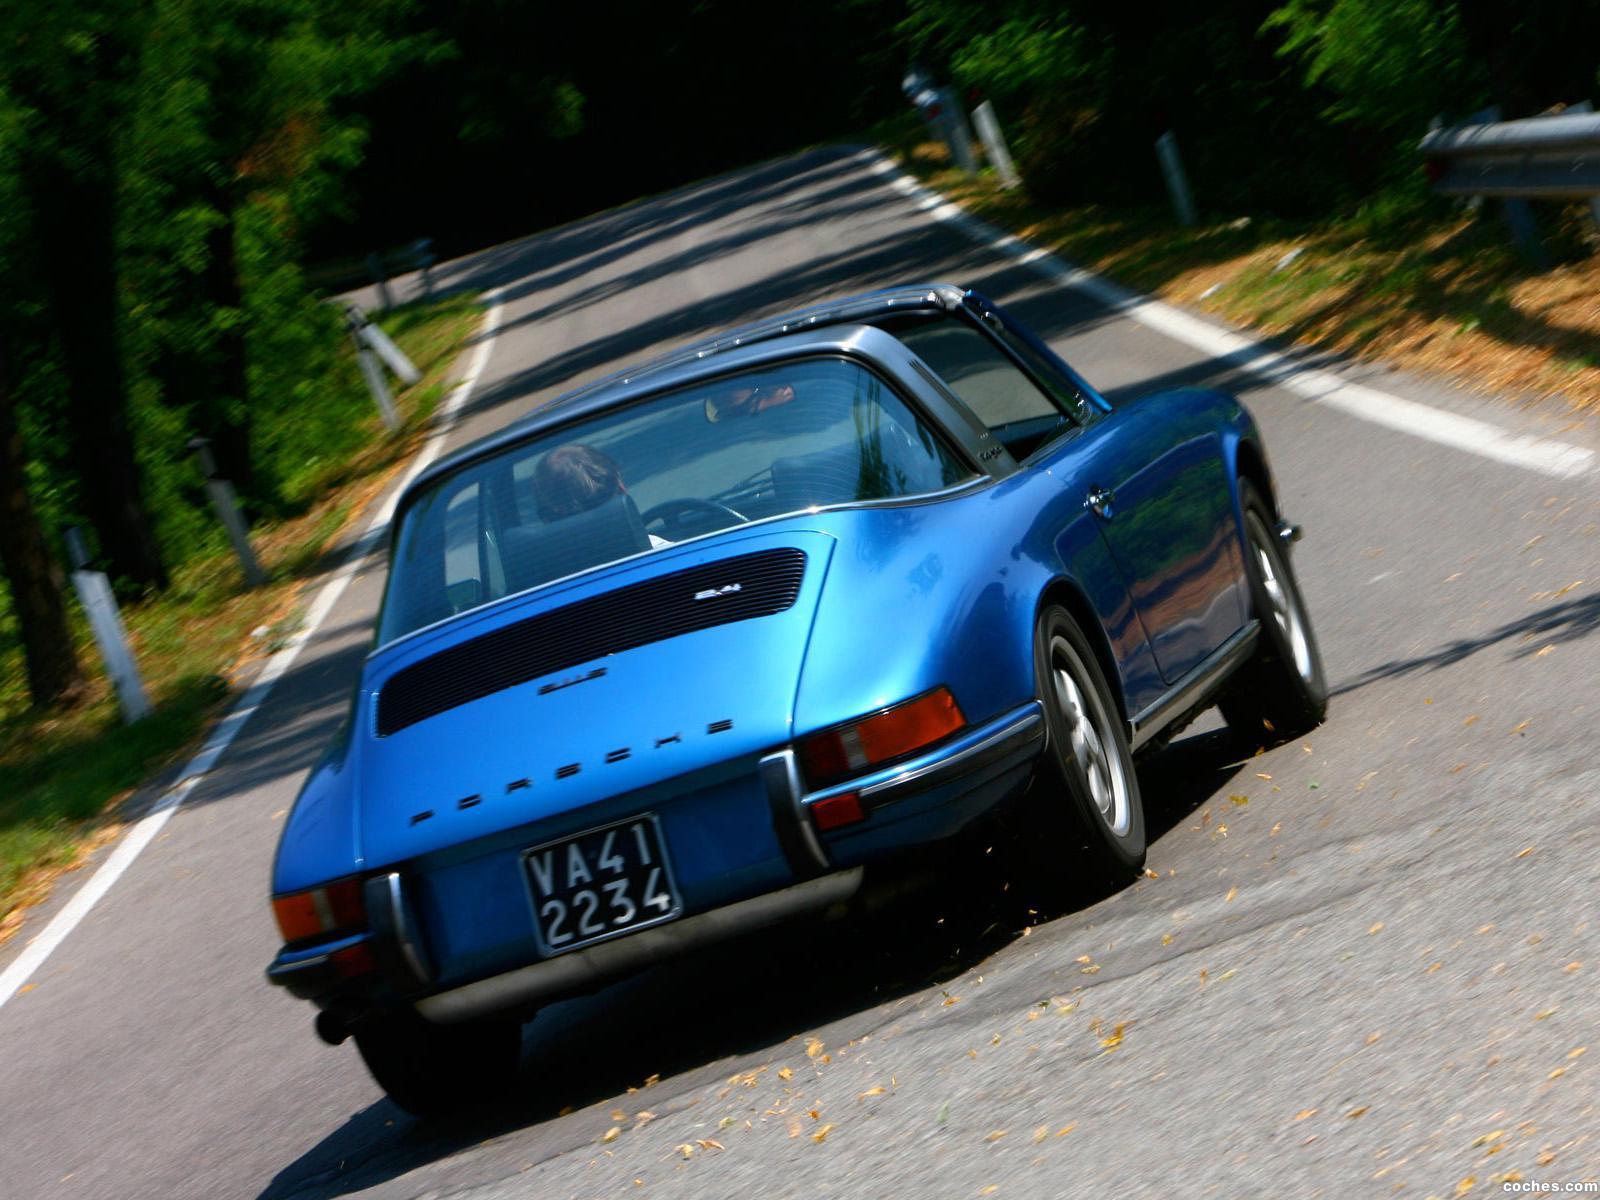 Foto 1 de Porsche 911 S Targa 911 1971